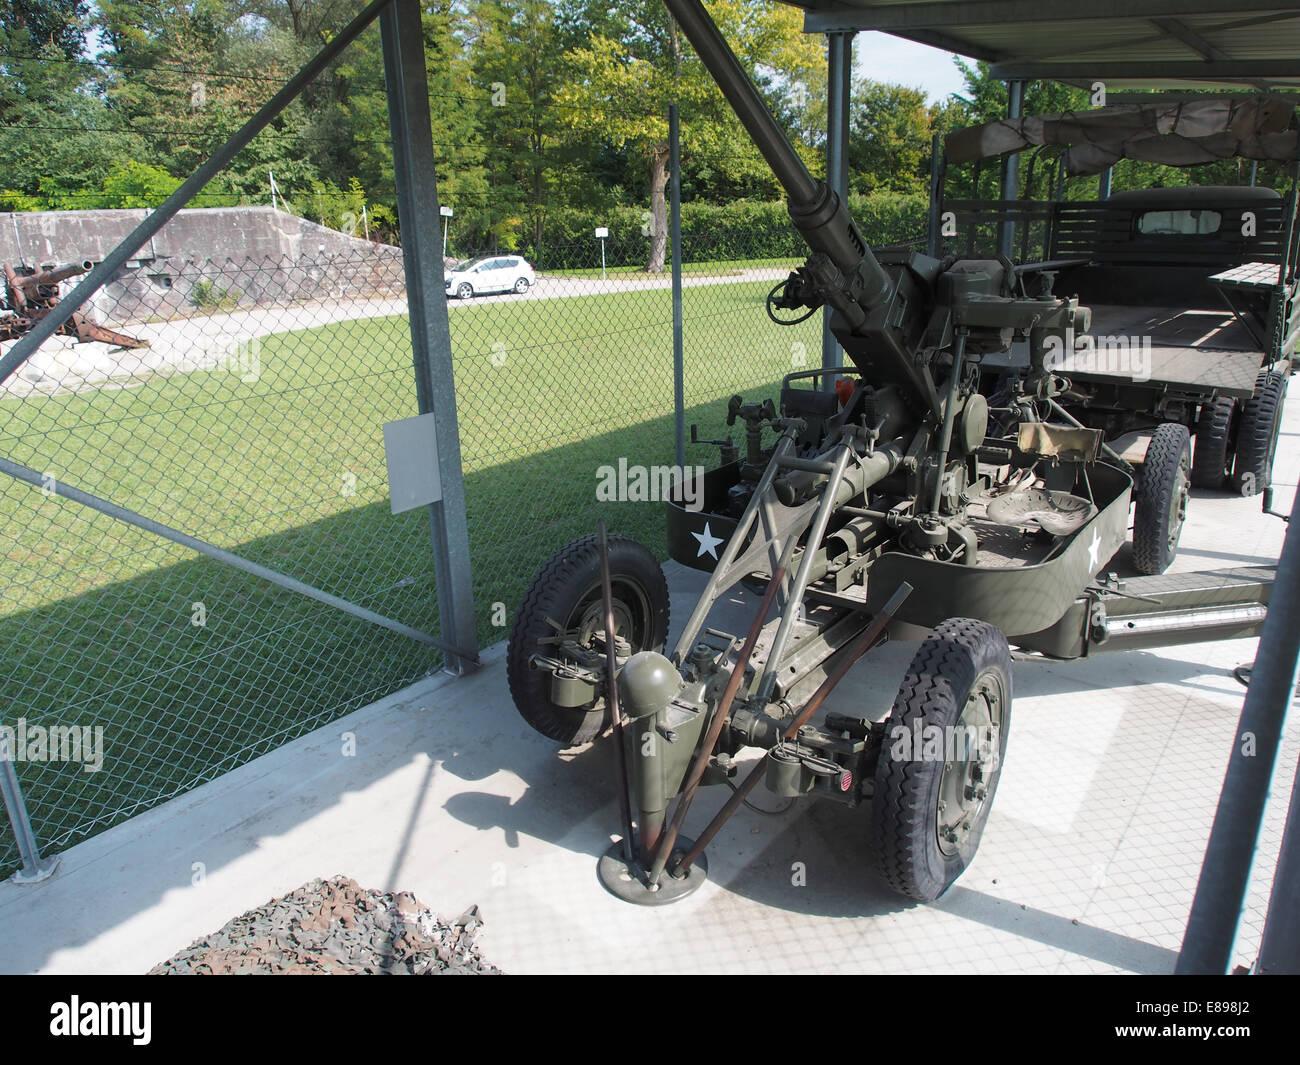 Bofors M1 AAA at Casemate 35-3 - Marckolsheim, photo 2 - Stock Image